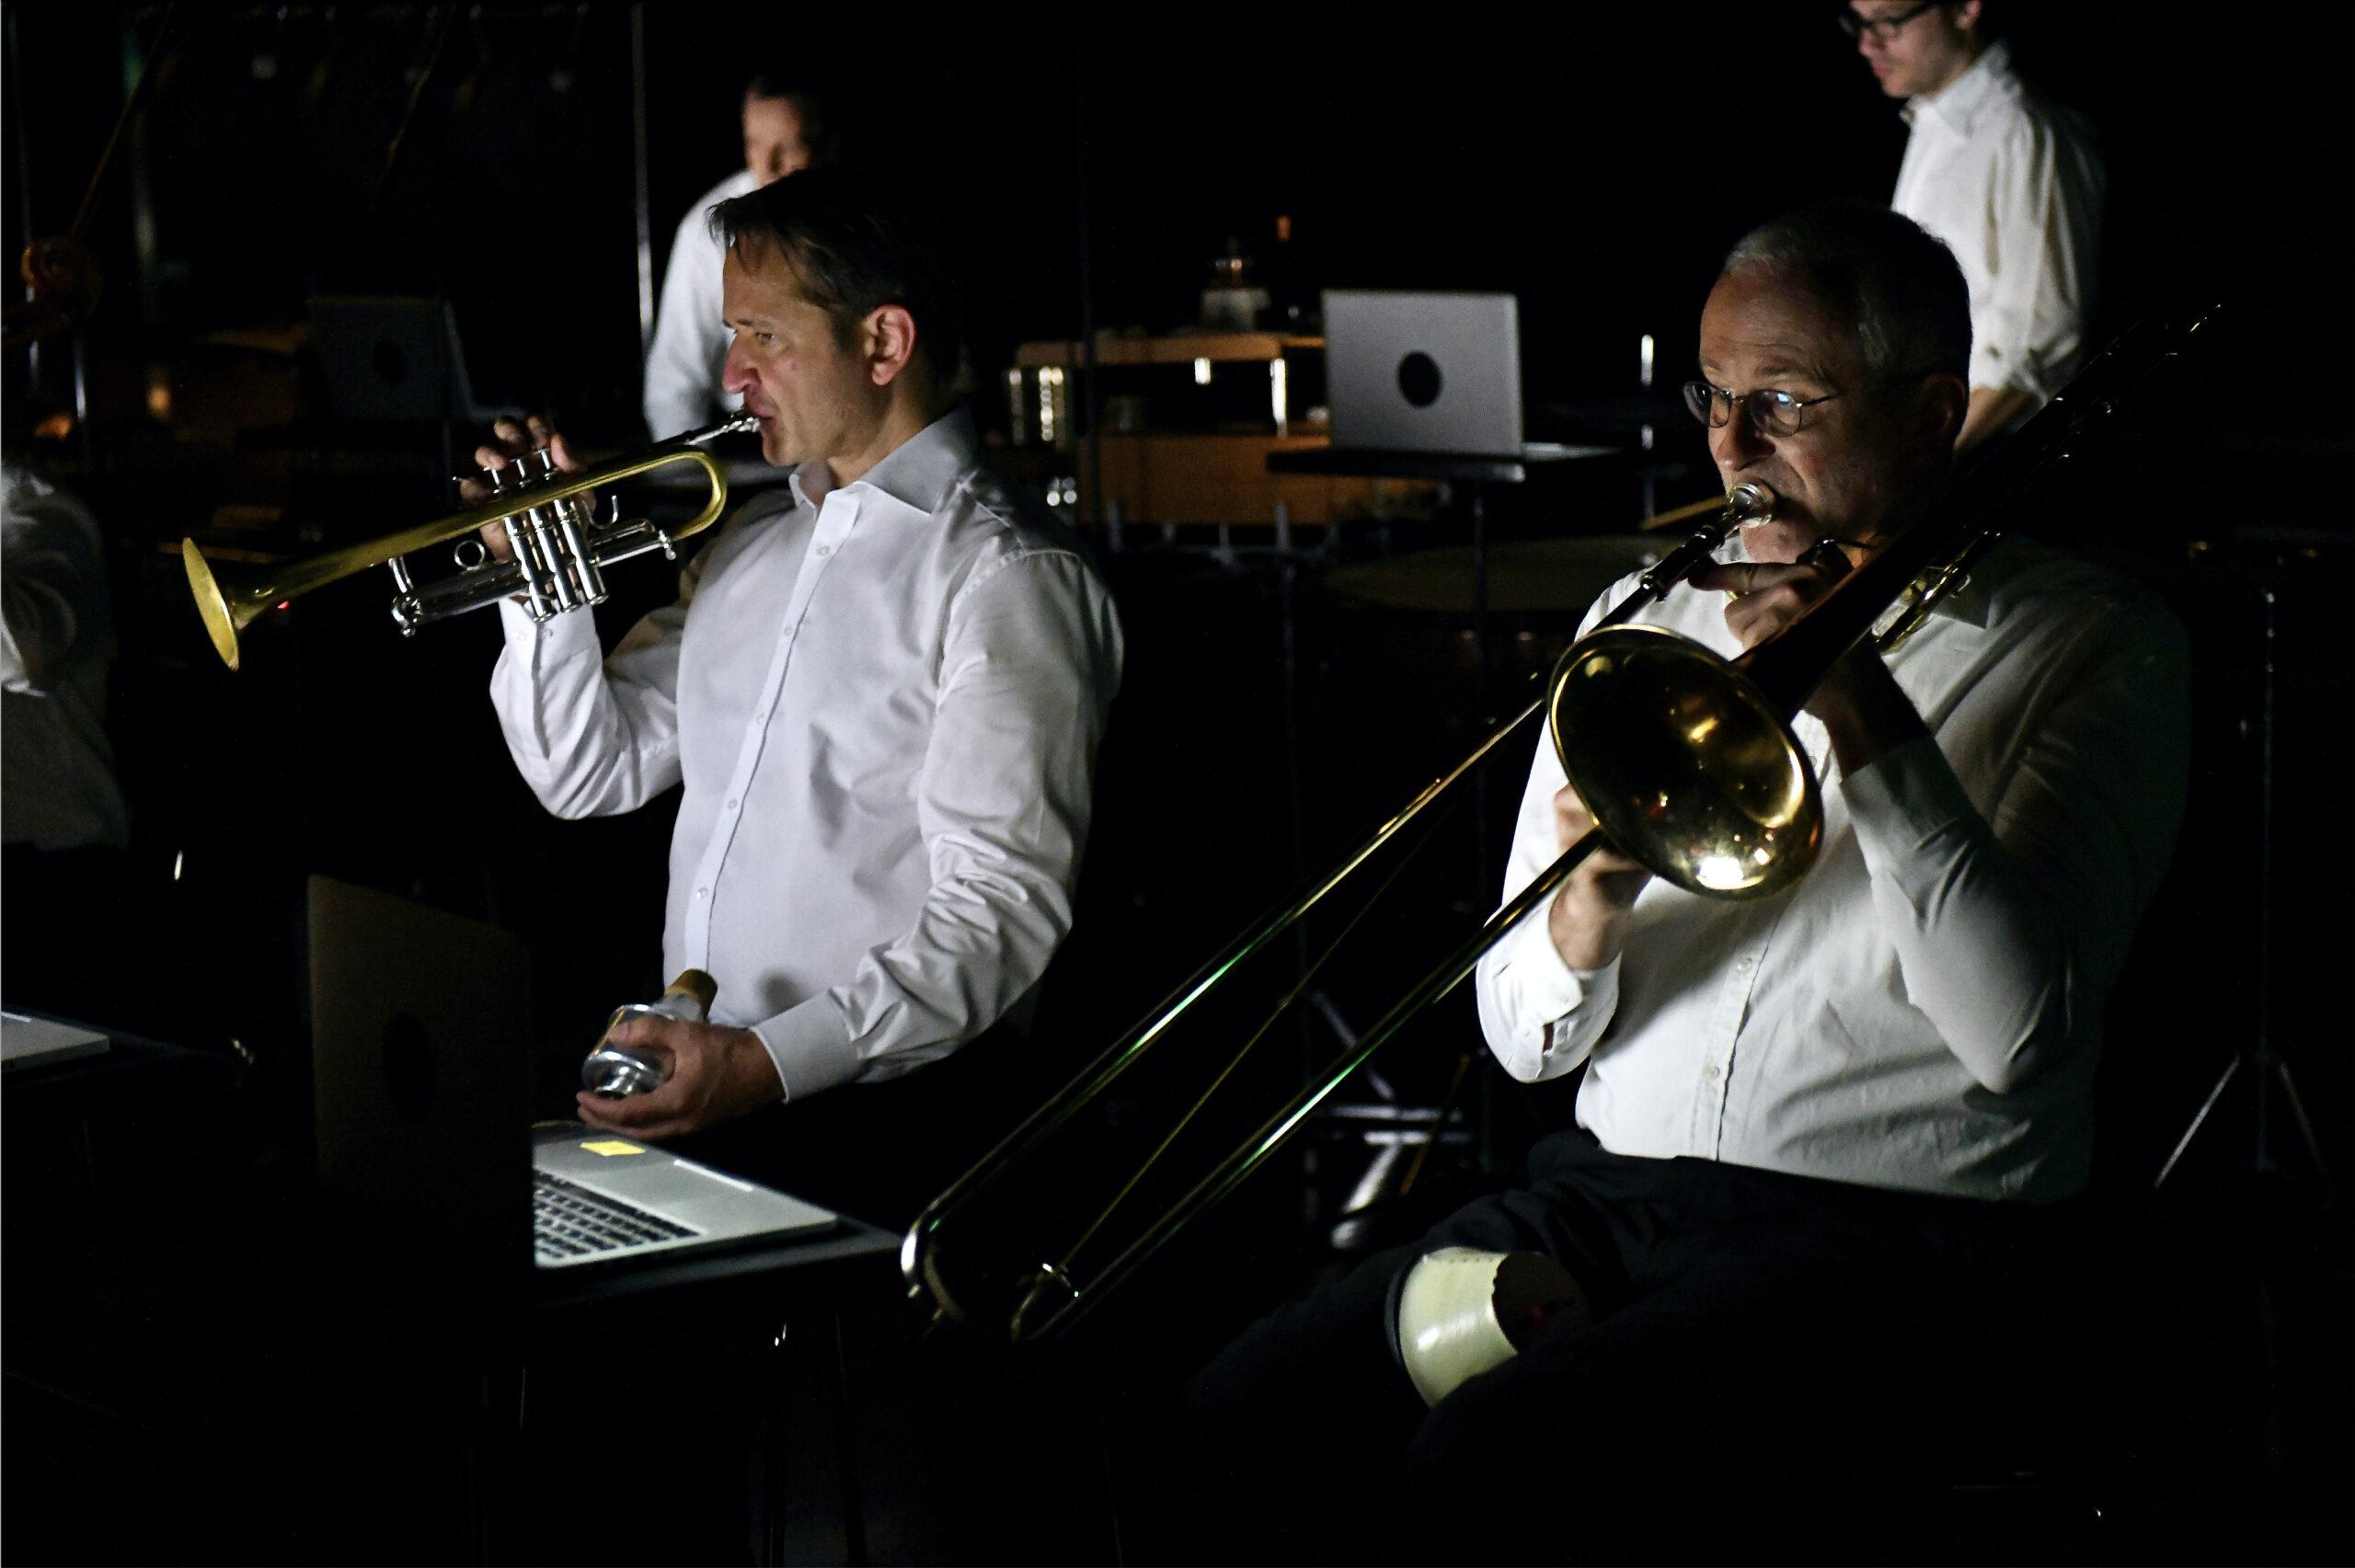 new work for ensemble ascolta, donaueschingen, germany – world premiere